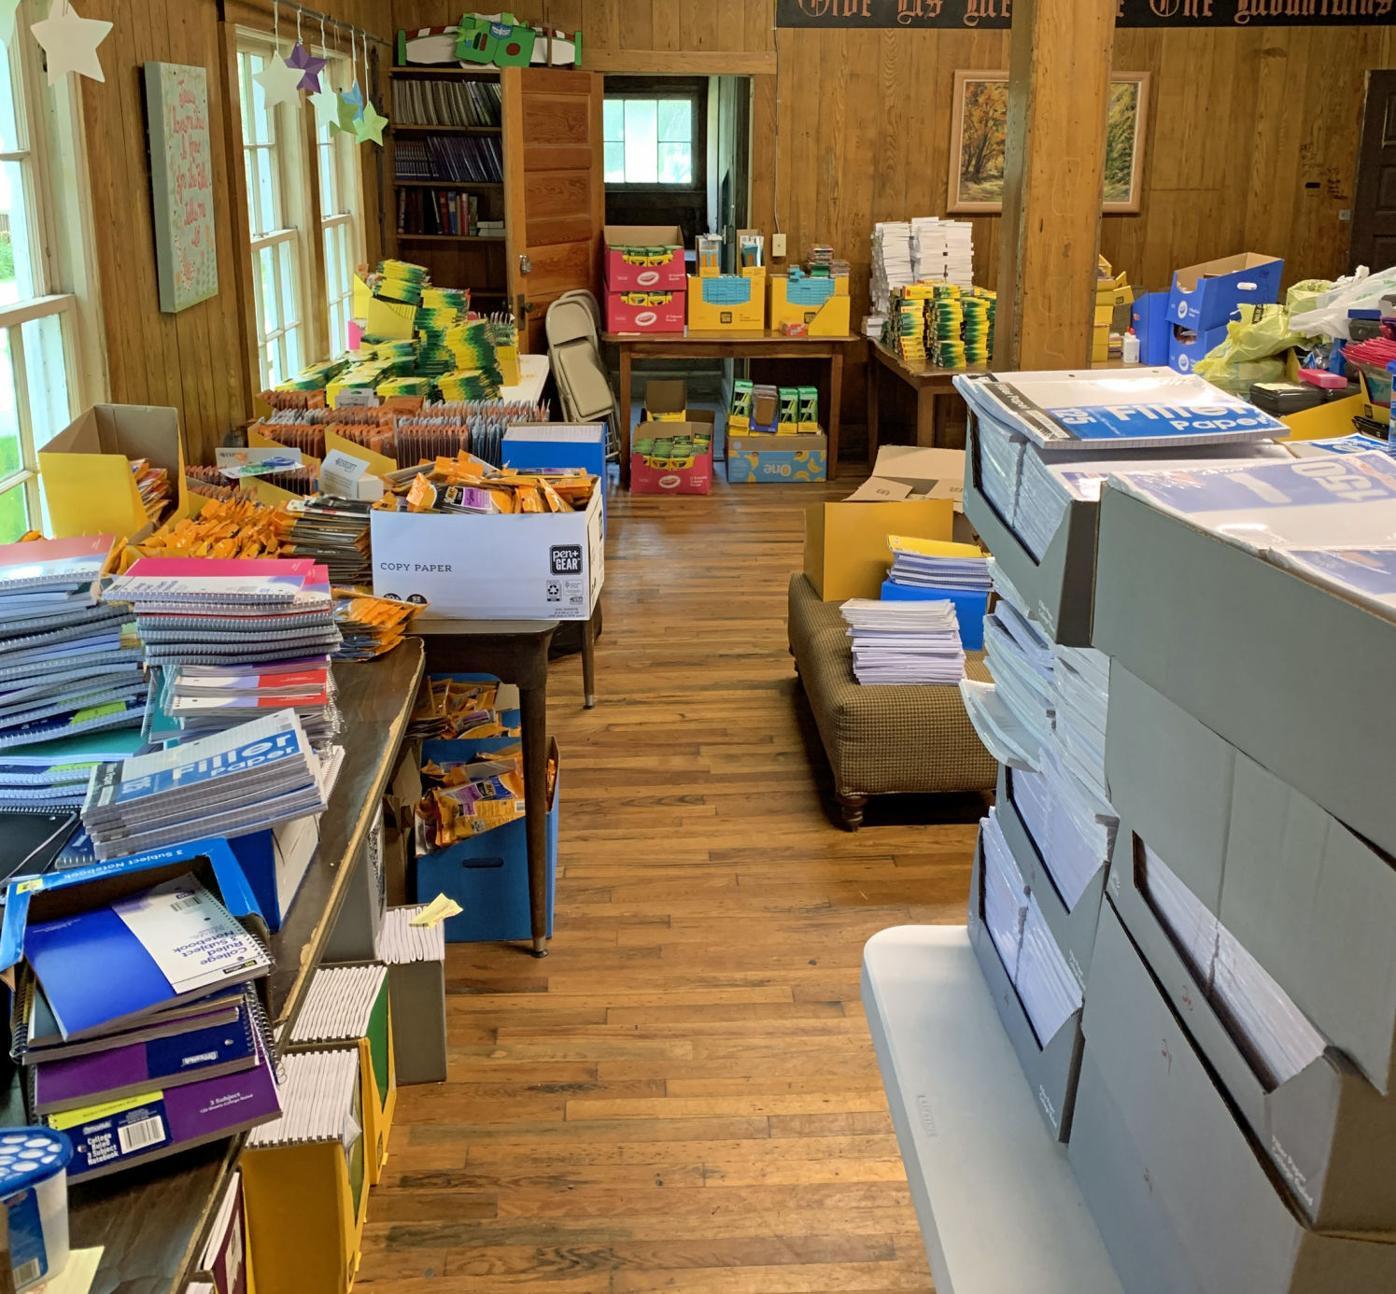 Supplies at Camp LH